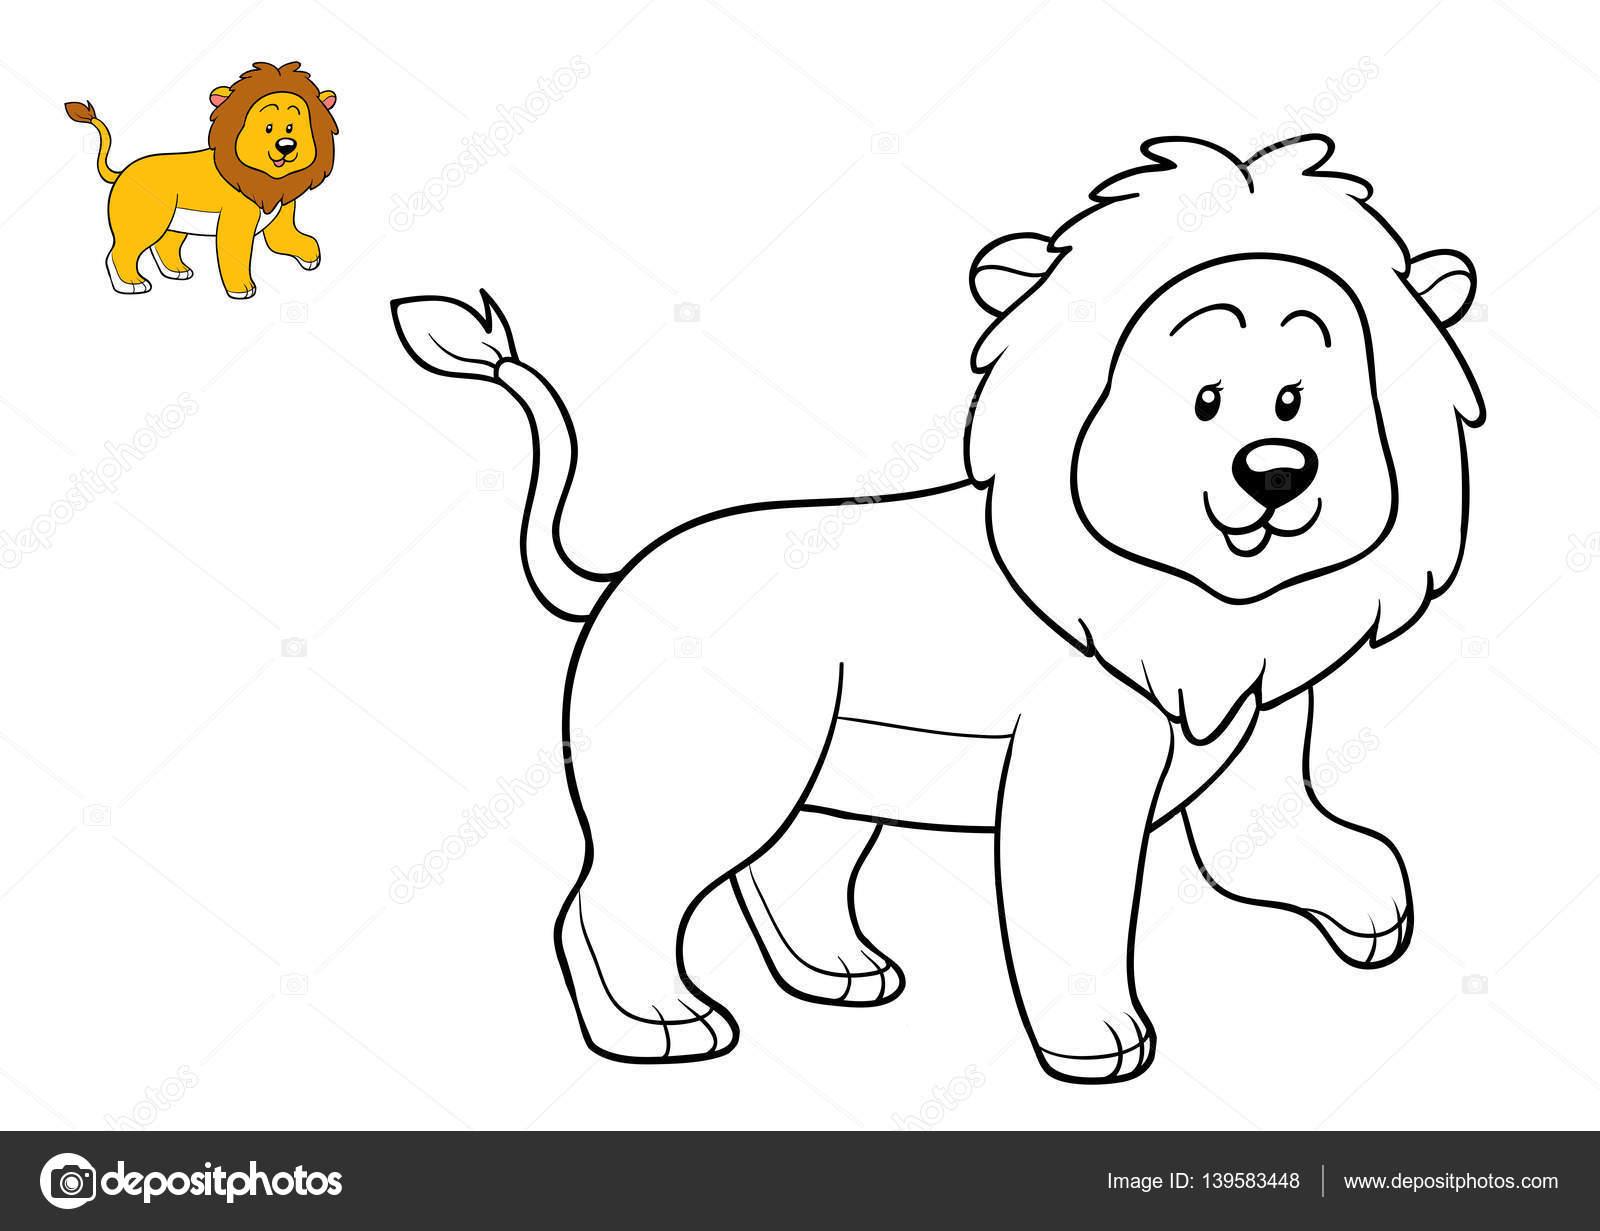 Coloring book, Lion — Stock Photo © ksenya_savva #139583448